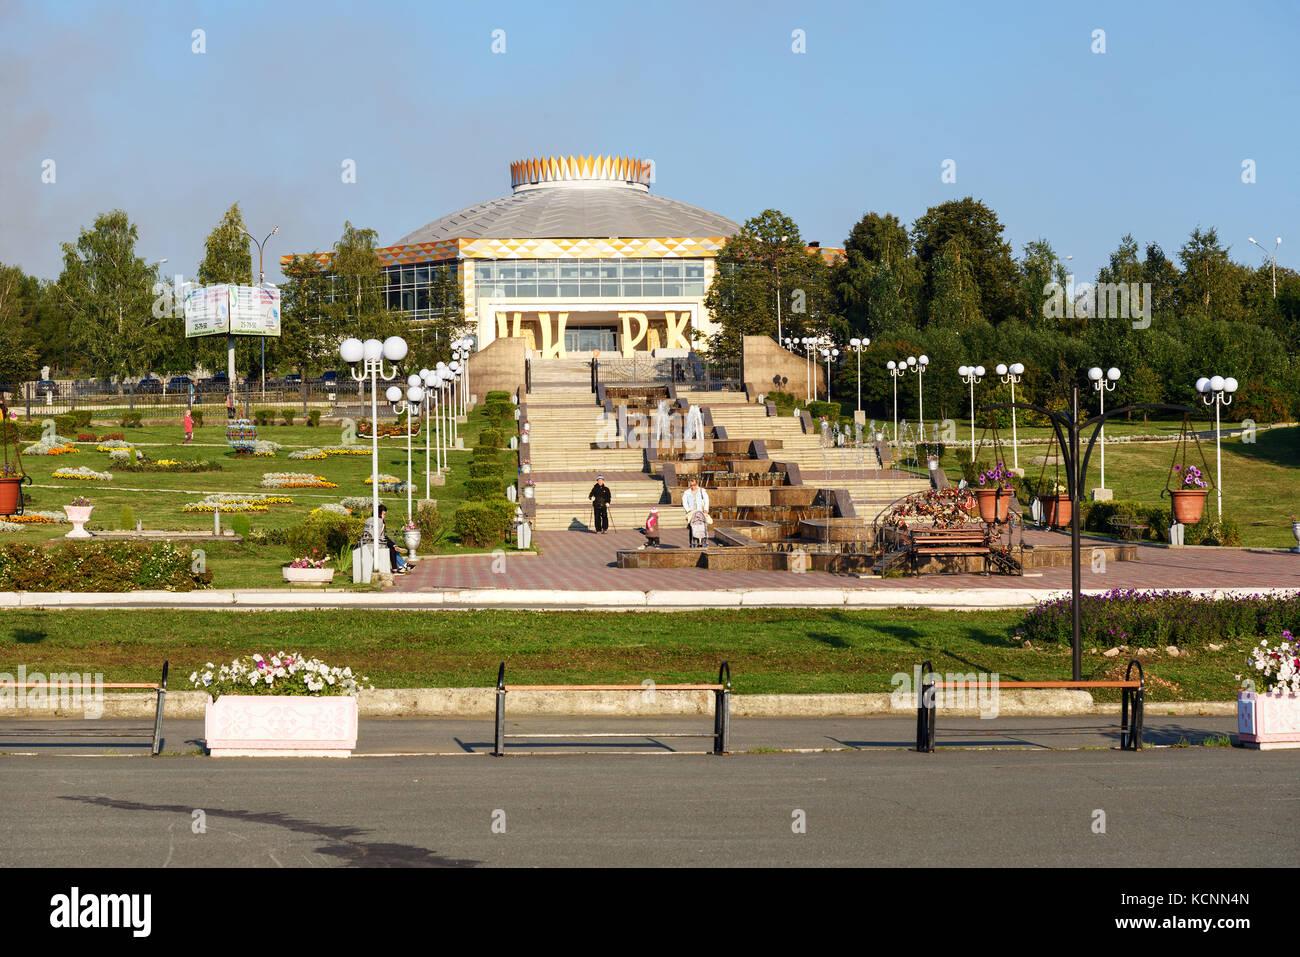 Travel to Nizhny Tagil, recreation centers: description, services, photo